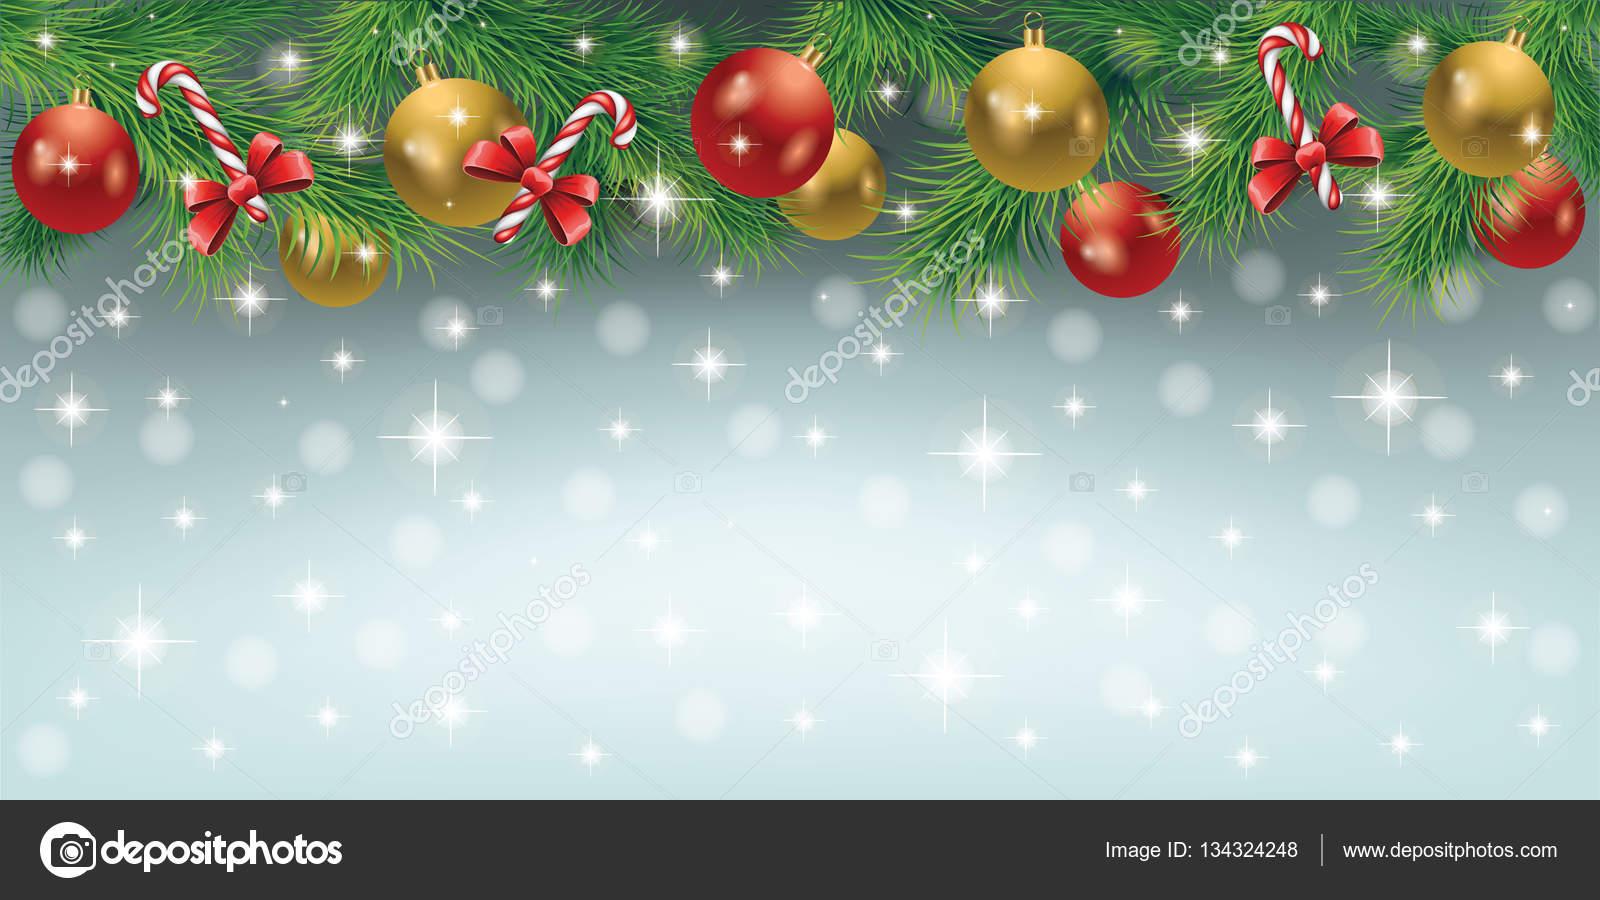 Elegant Christmas Background Hd.Elegant Christmas Background Stock Vector C Silviya87